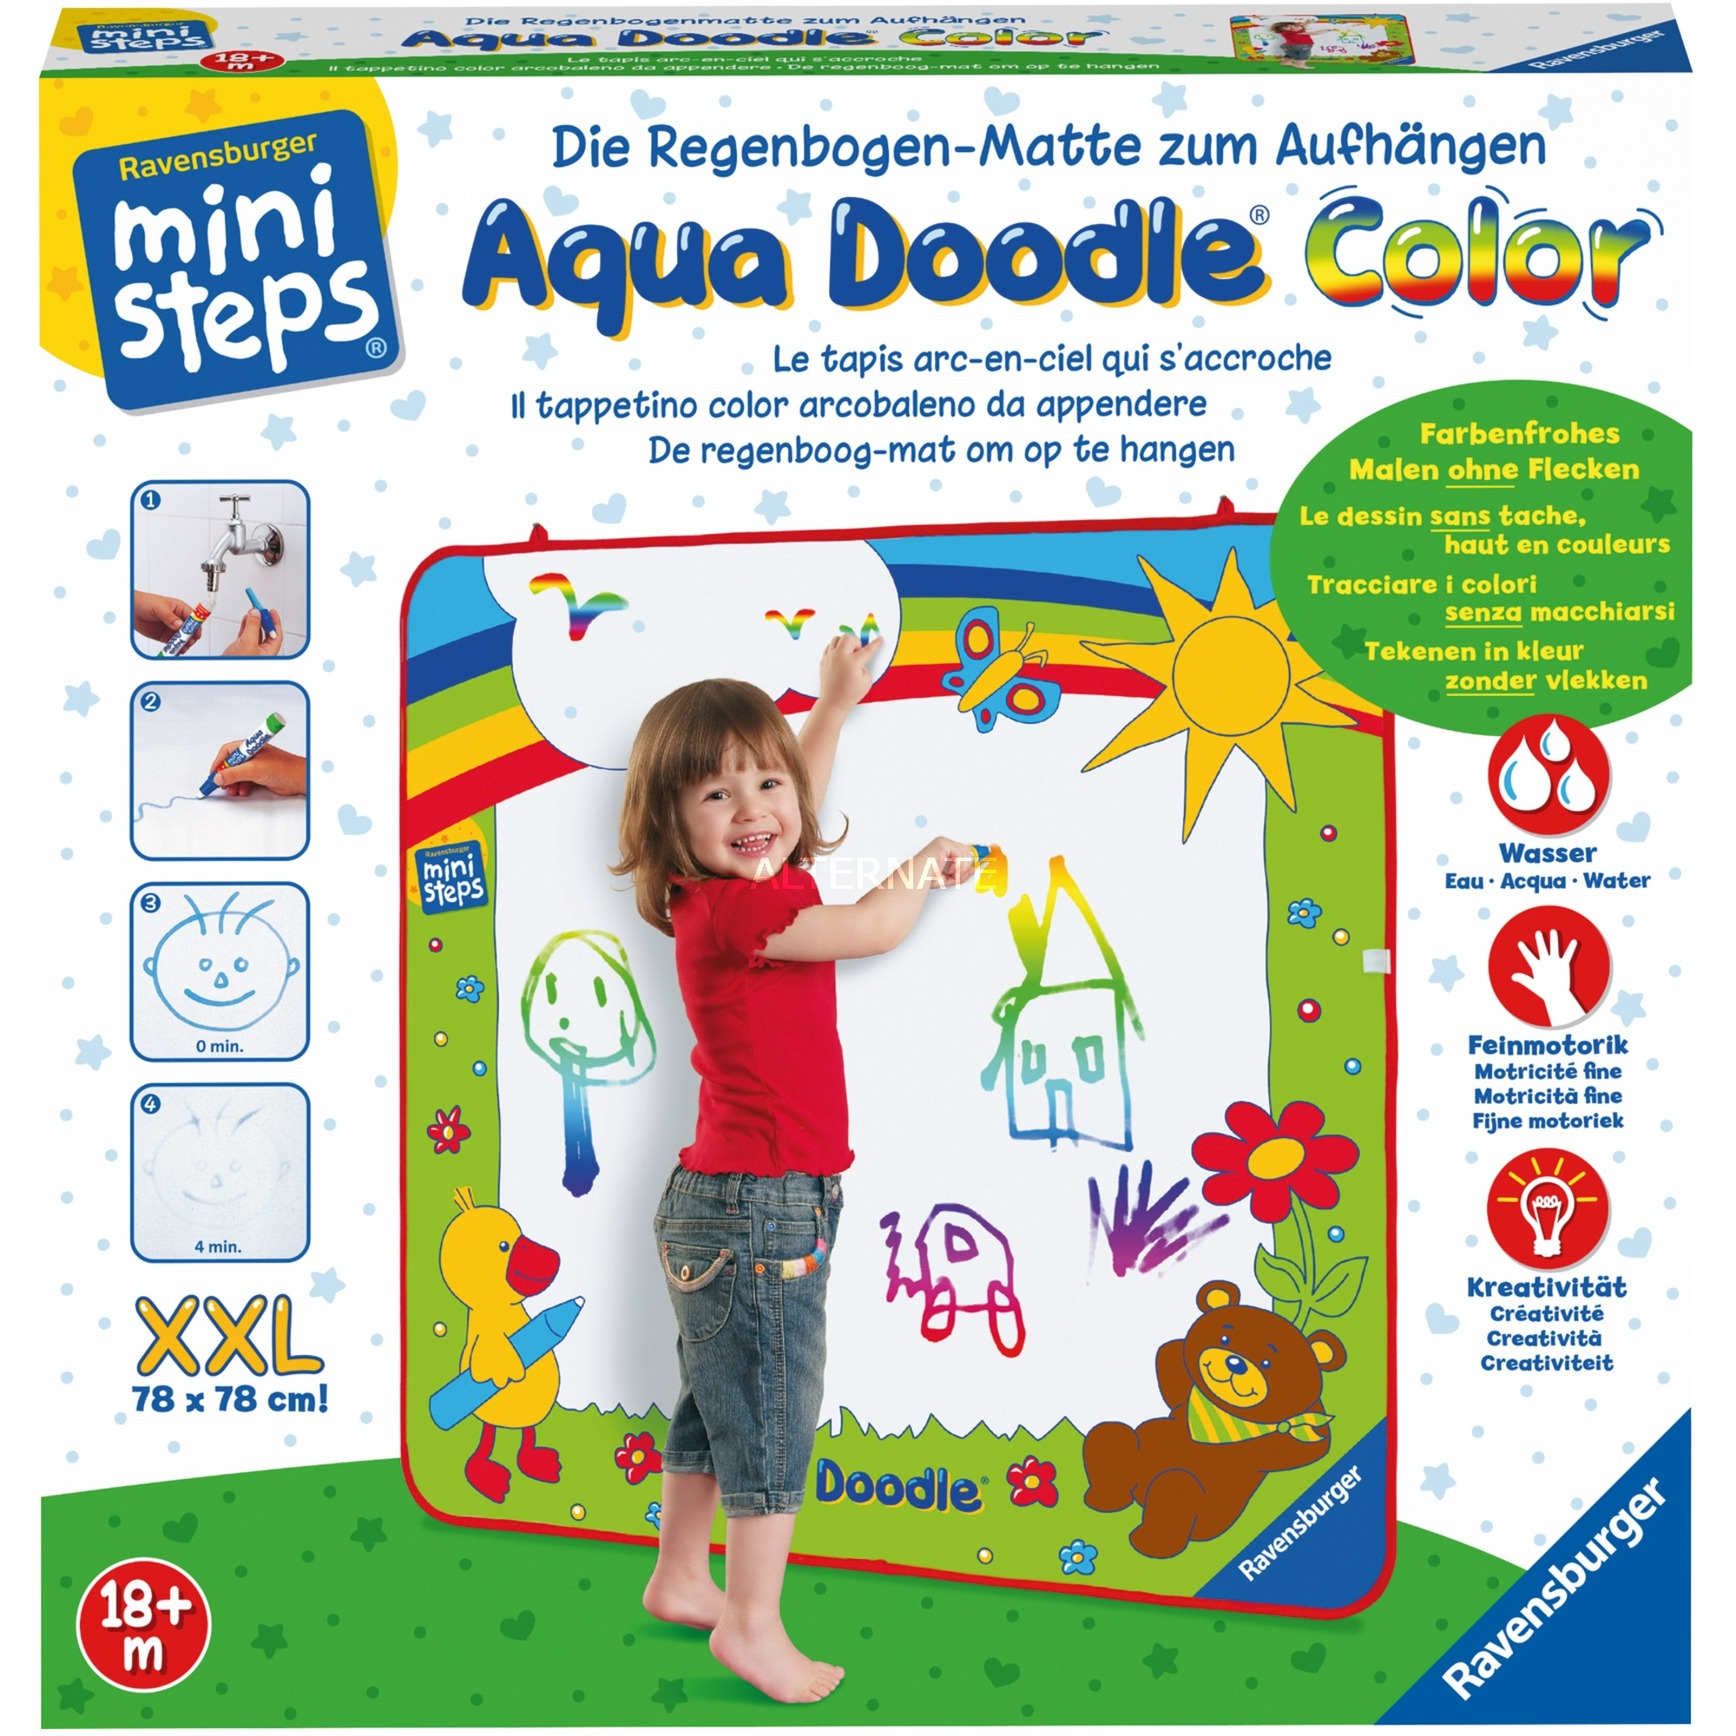 04545 Juguetes de pintura con agua para niños